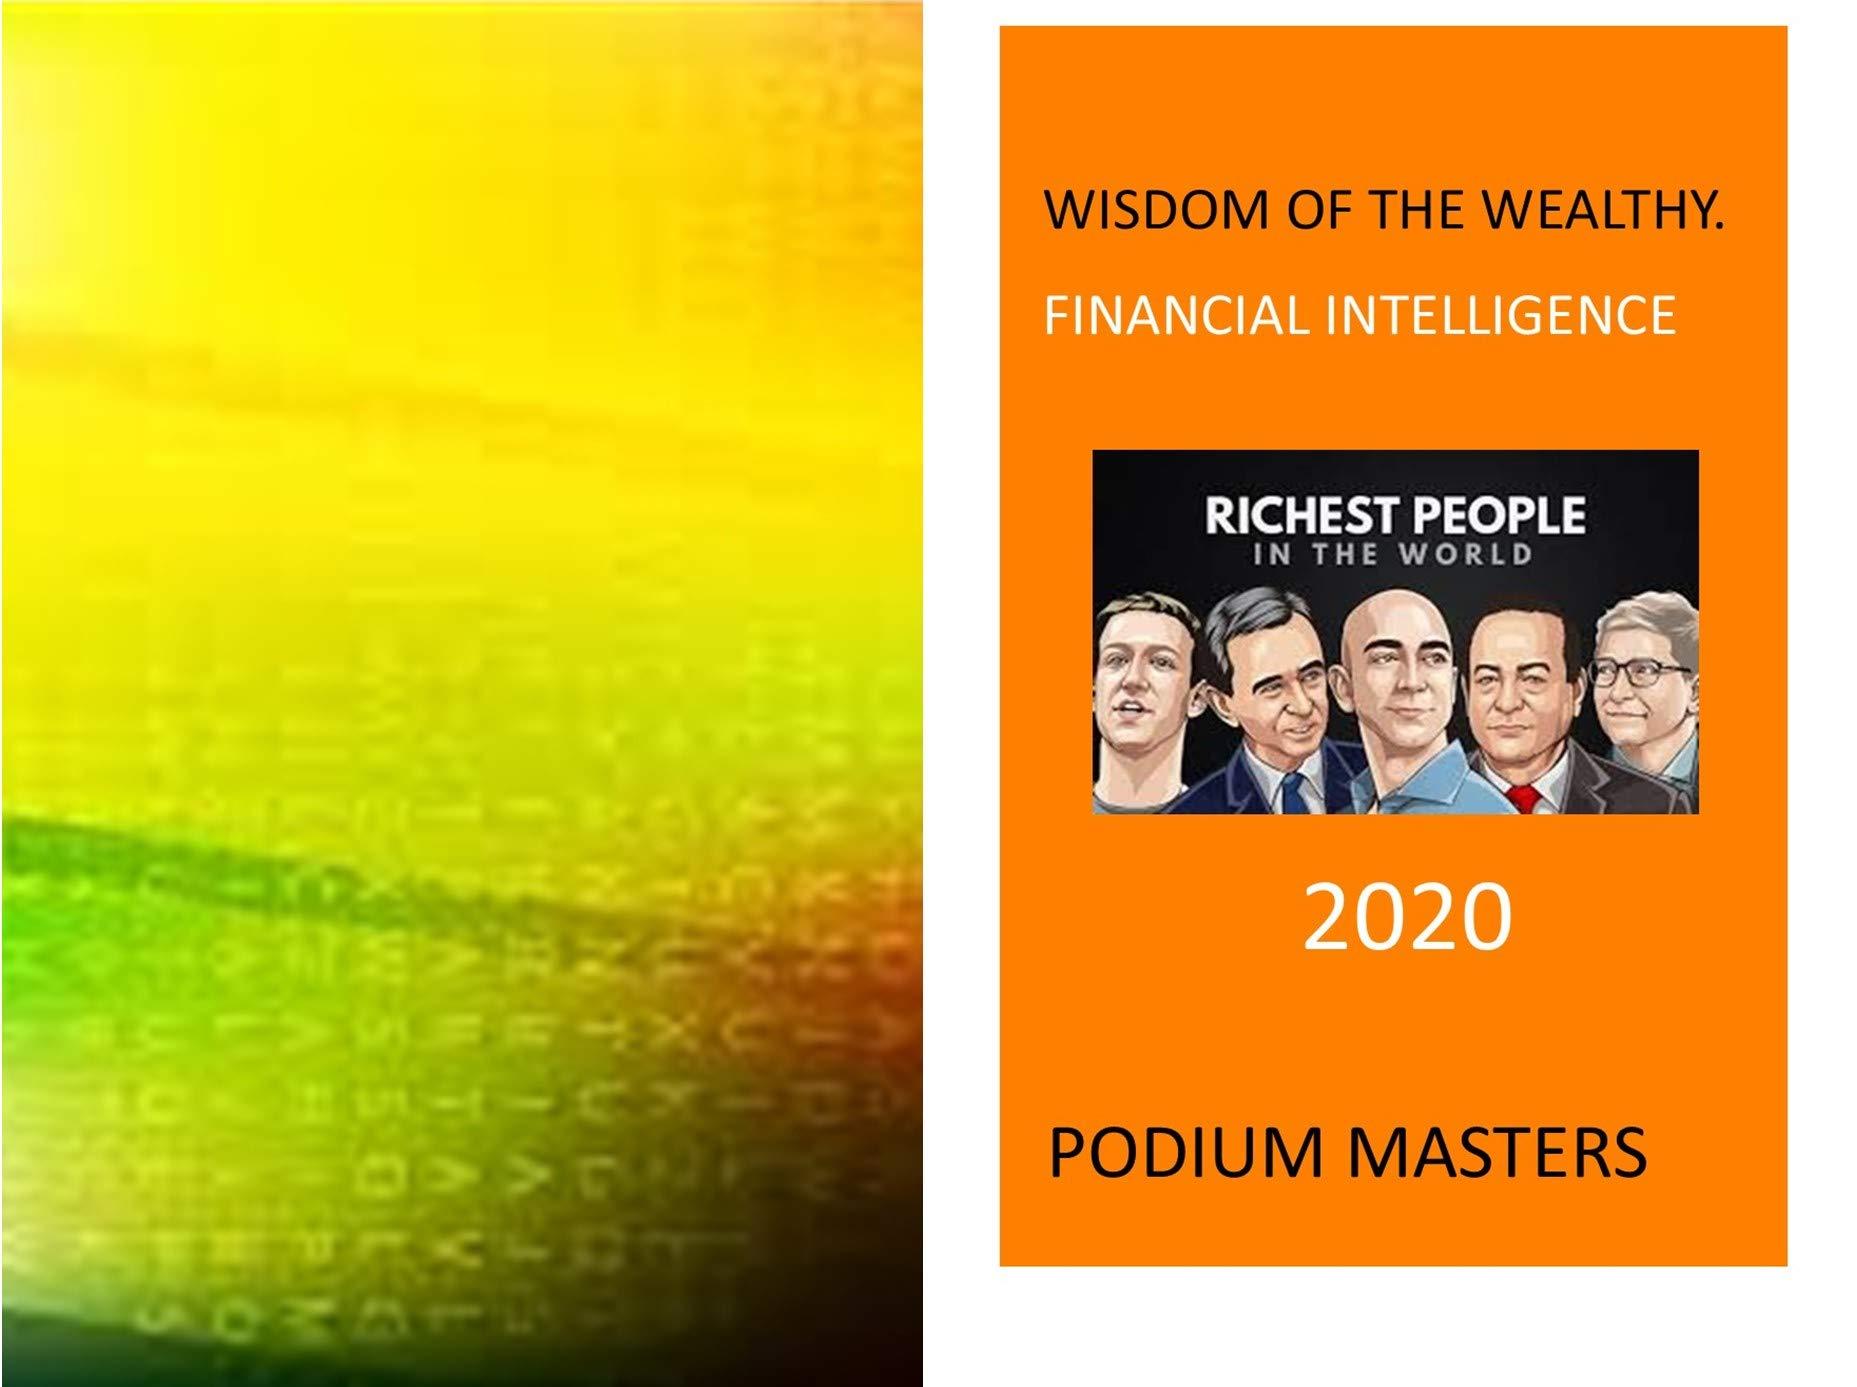 WISDOM OF THE WEALTHY: FINANCIAL INTELLIGENCE